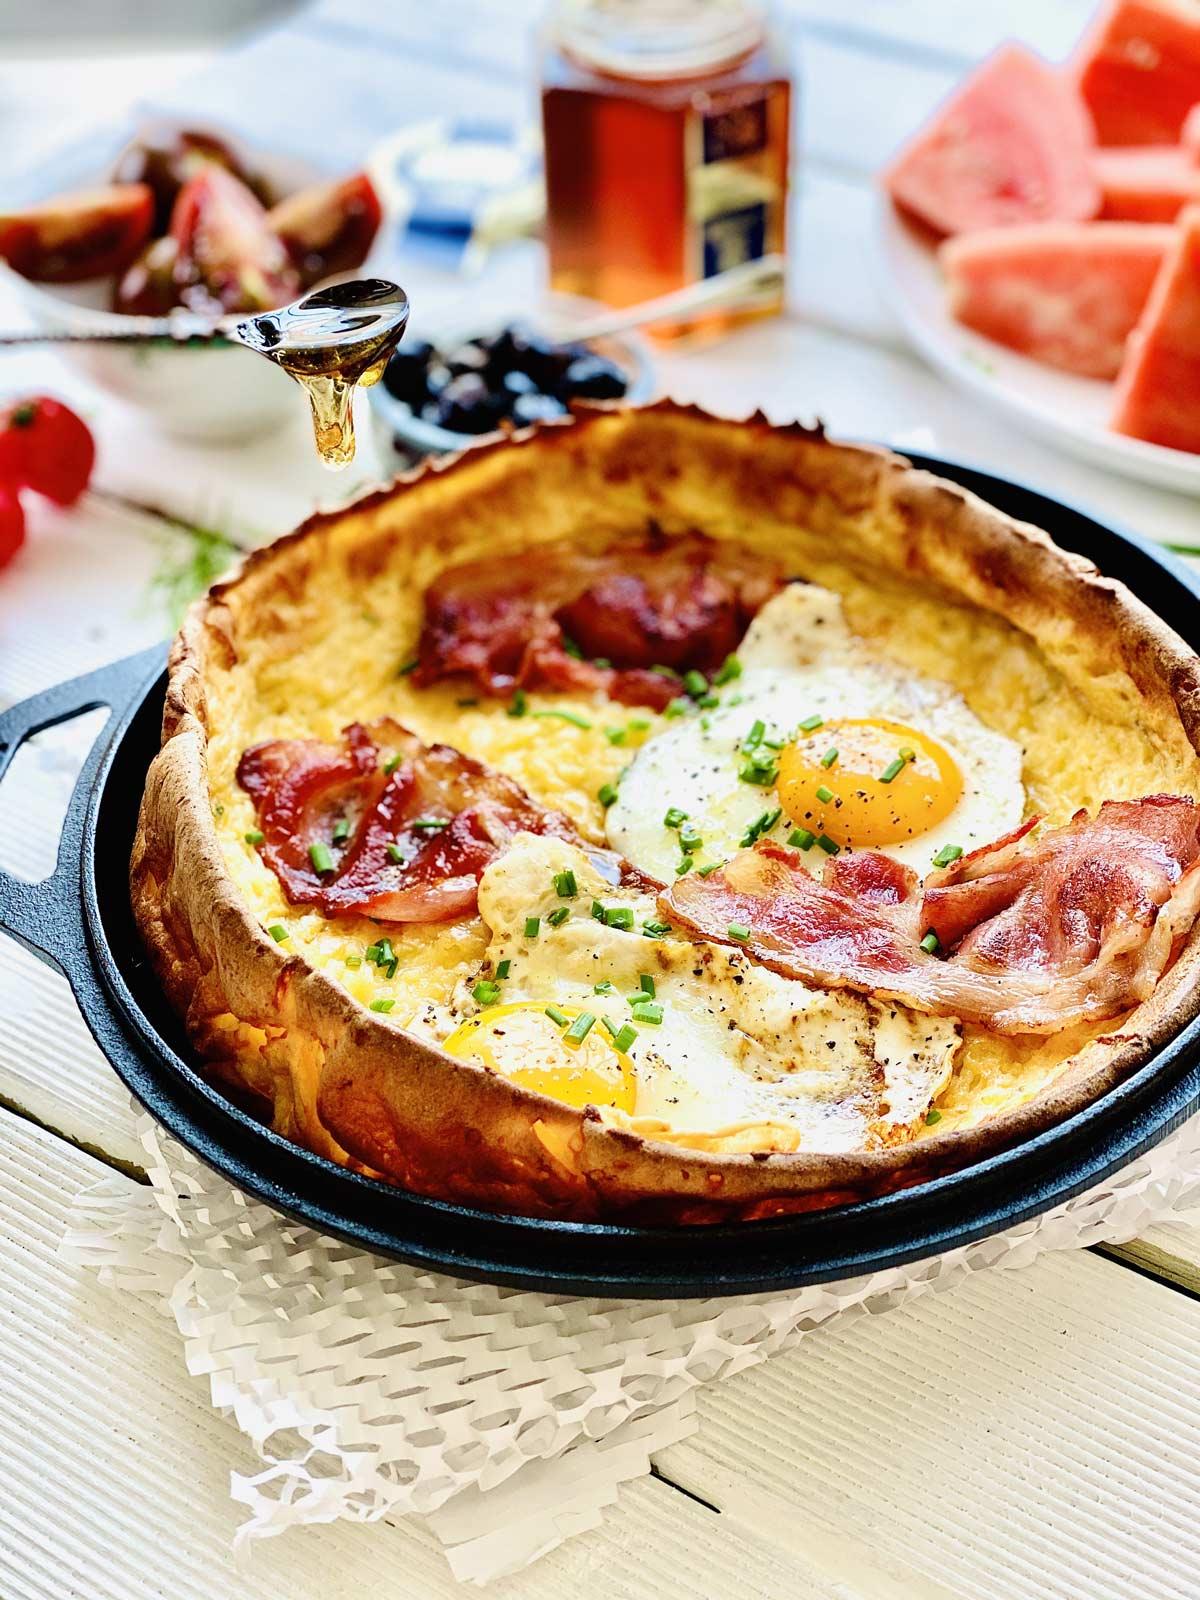 Bacon and Eggs Dutch Pancakes